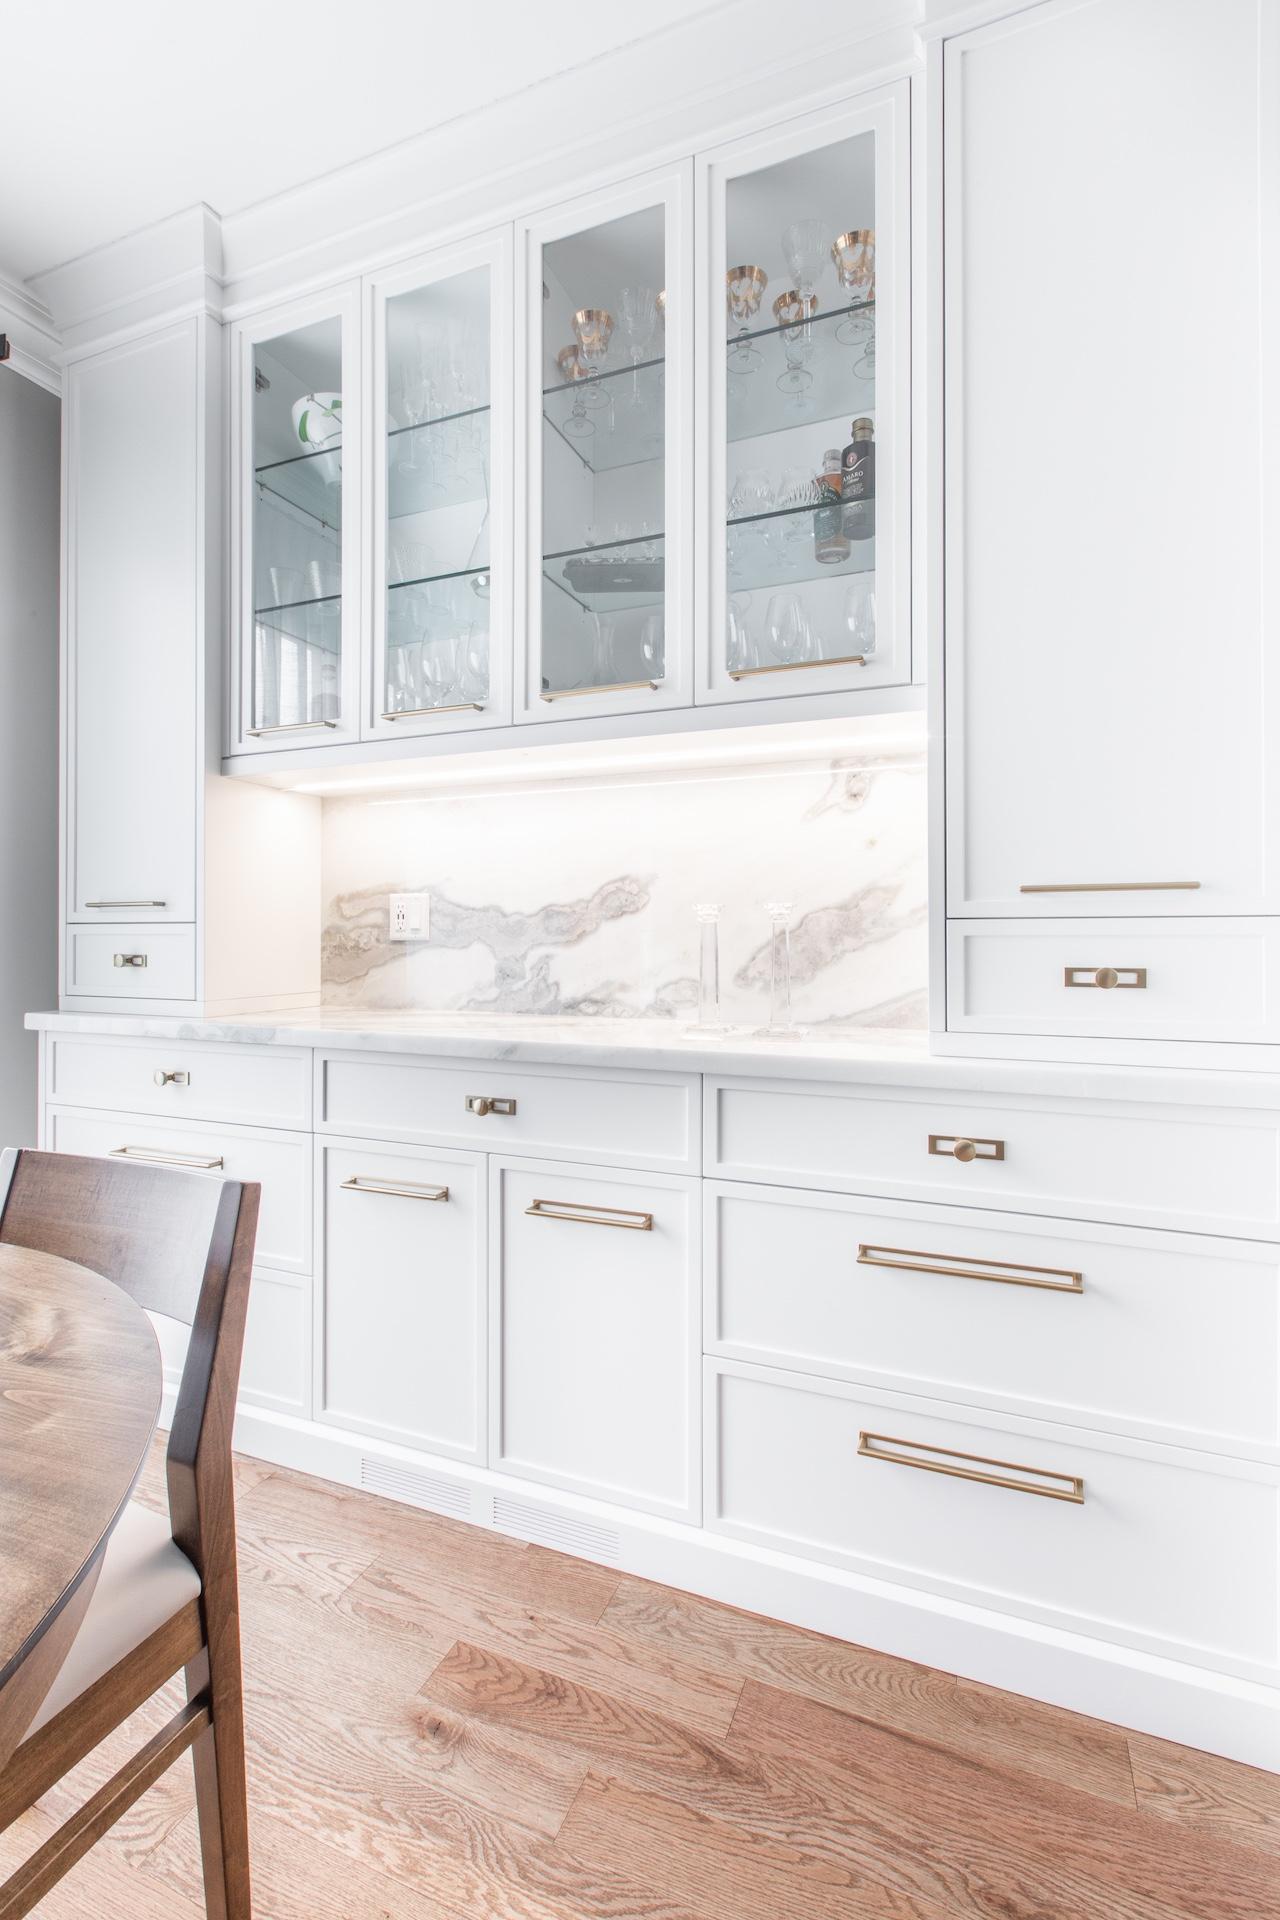 White kitchen with gold hardware